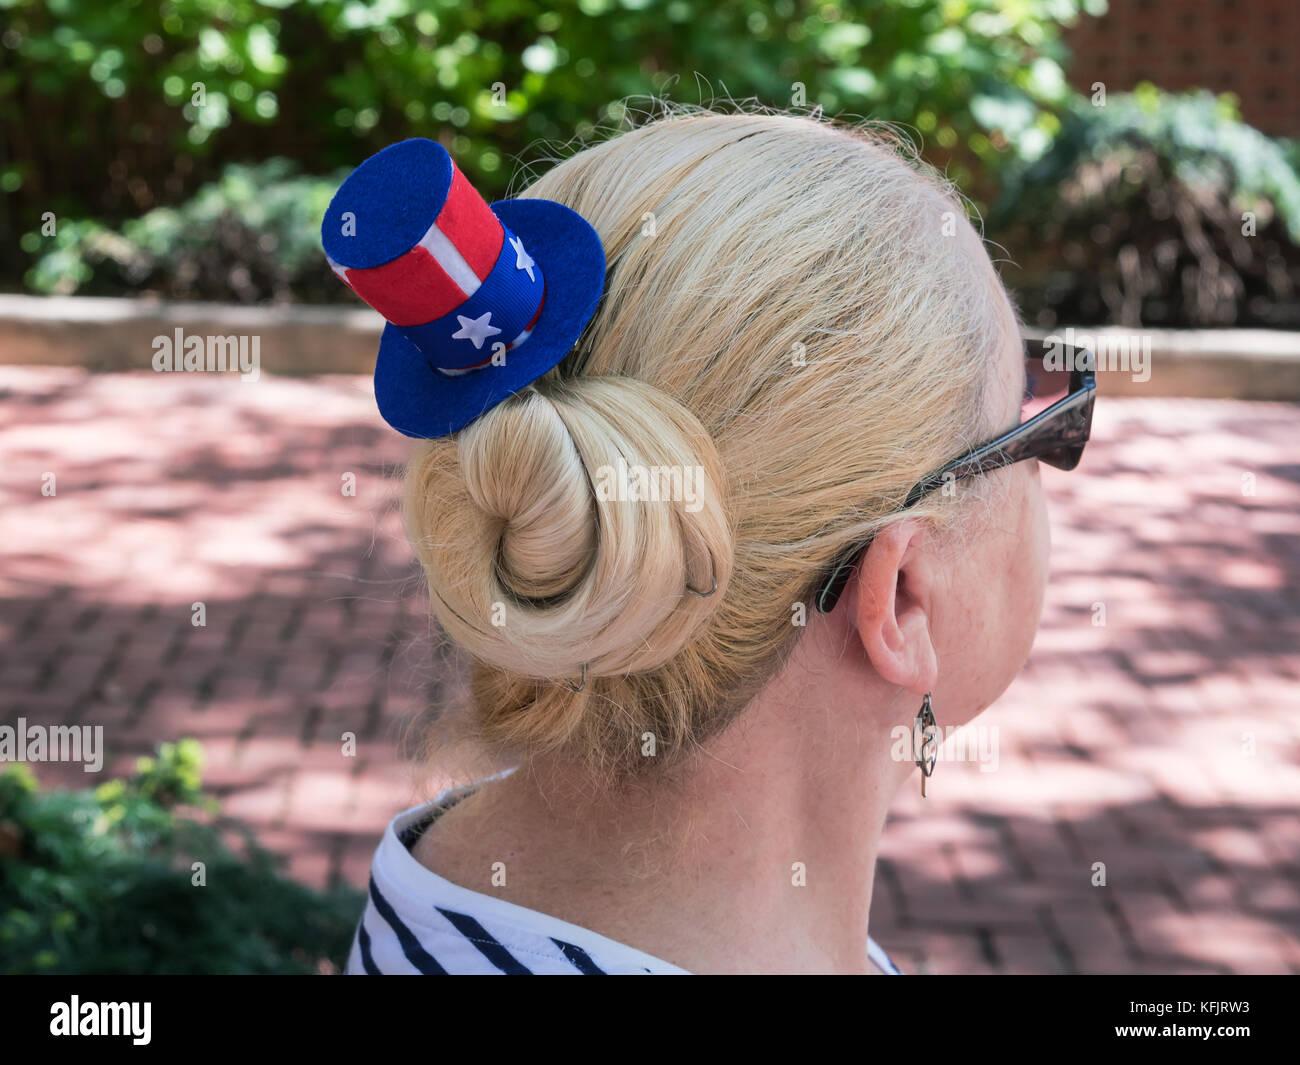 Tourist woman with American souvenir hat, Philadelphia, Pennsylvania, USA - Stock Image